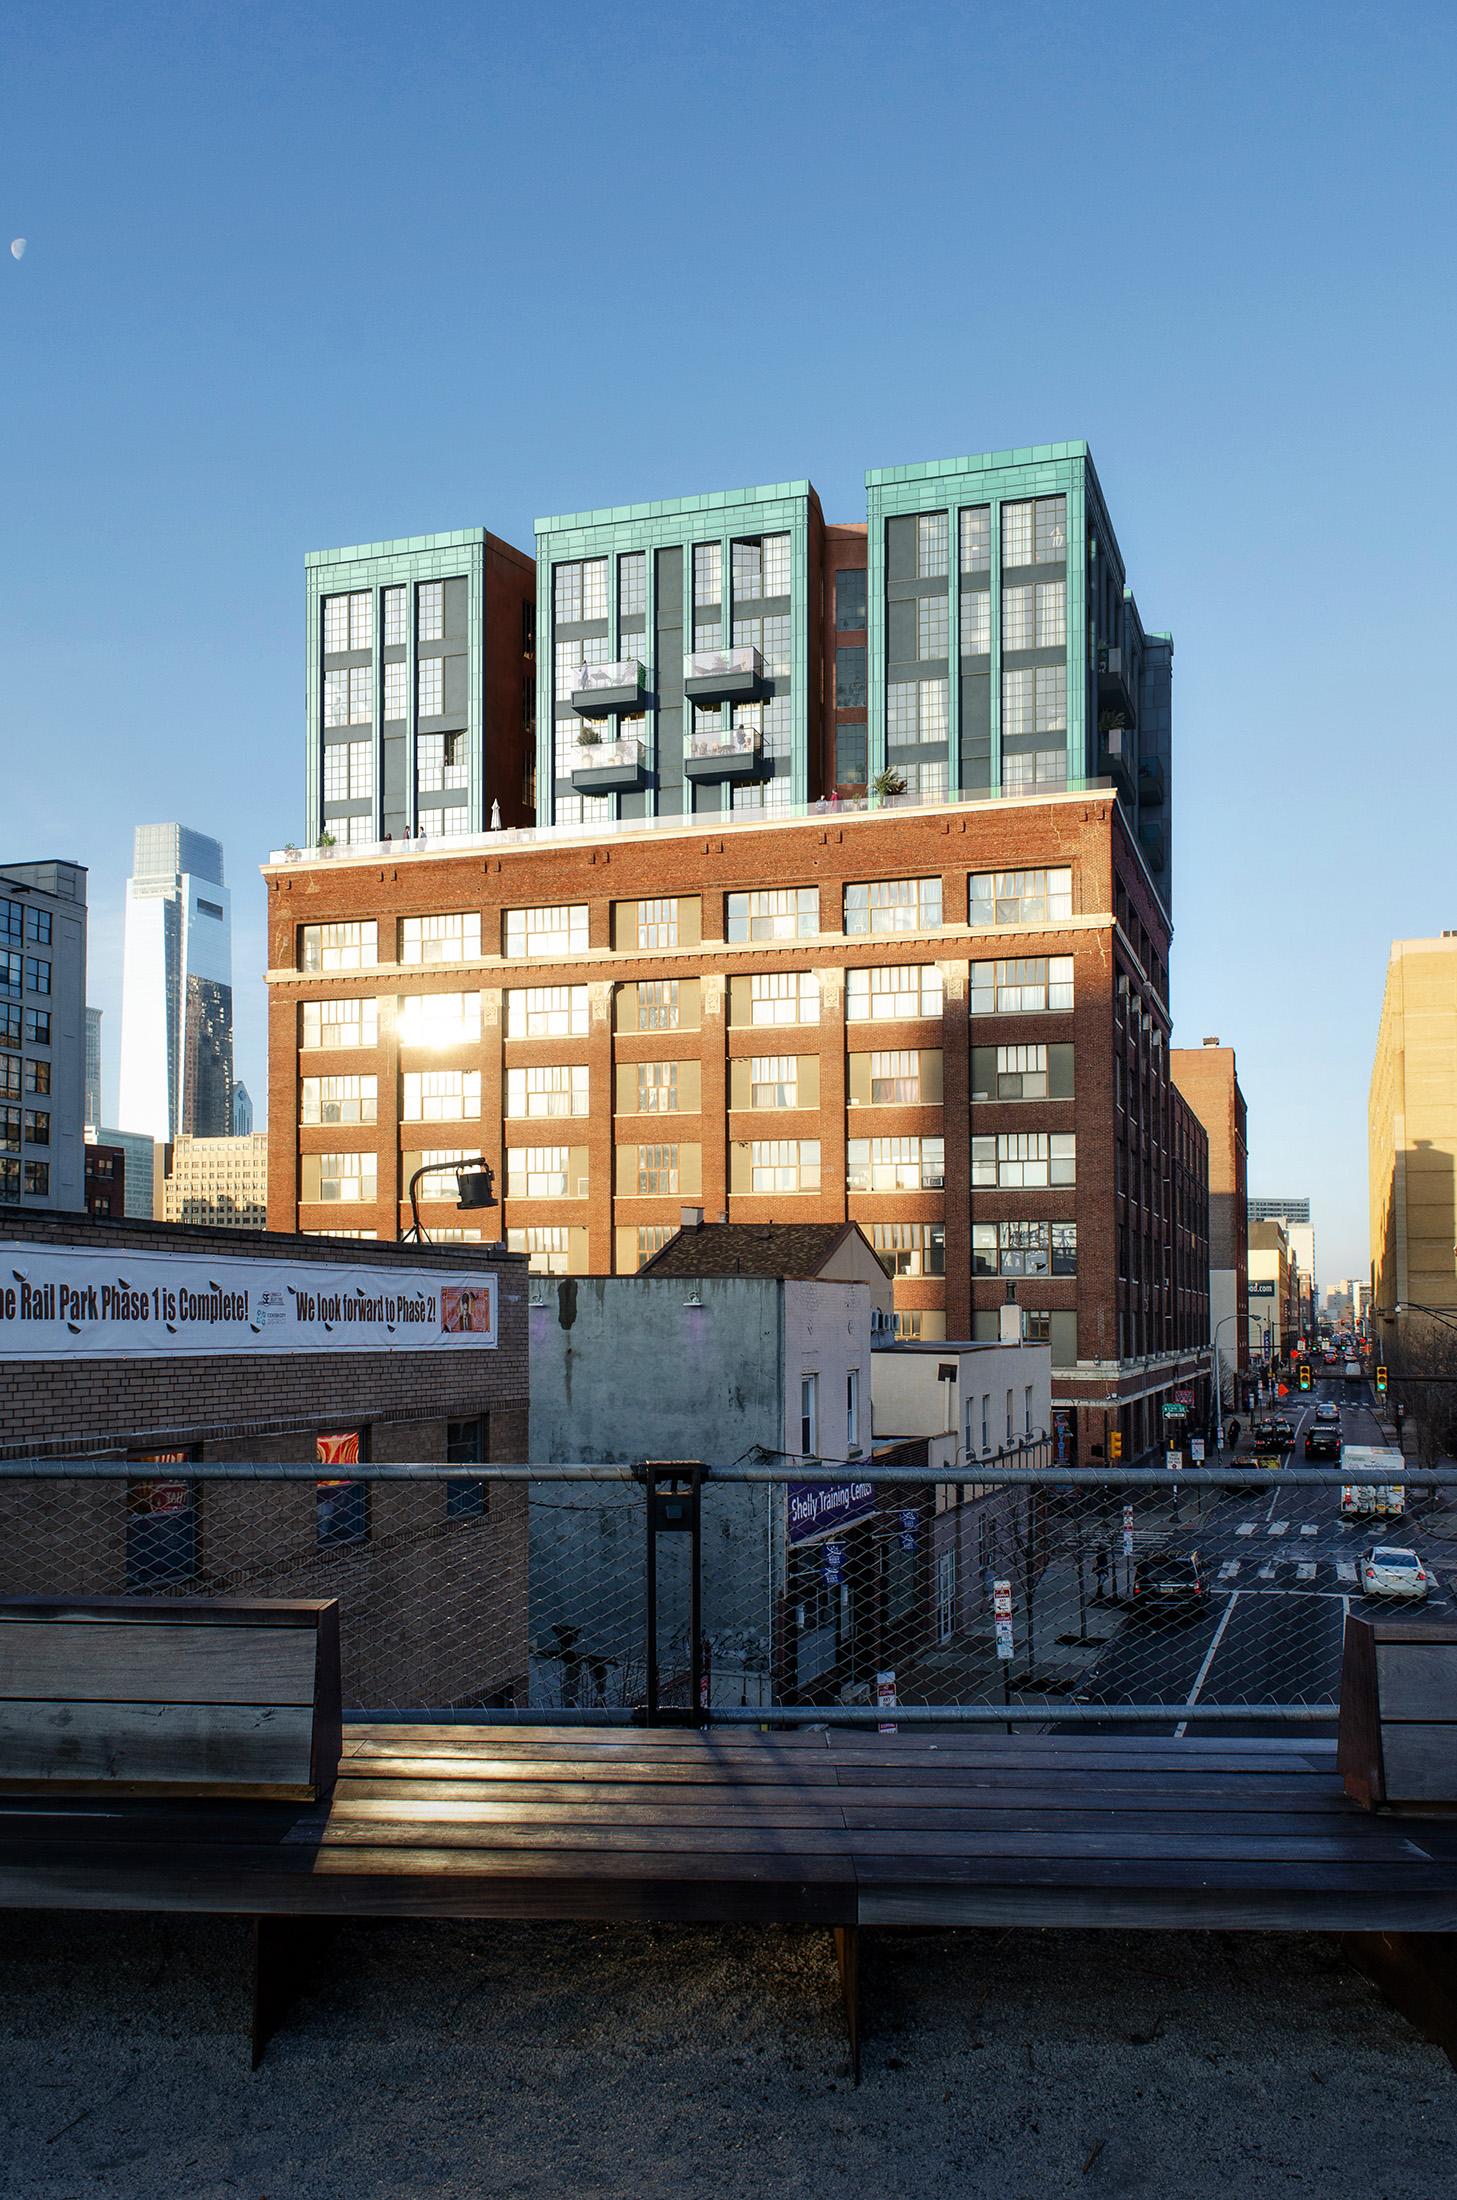 Ian Smith Design Group, 330N 12th Street Philadelphia, EEUU, 2020